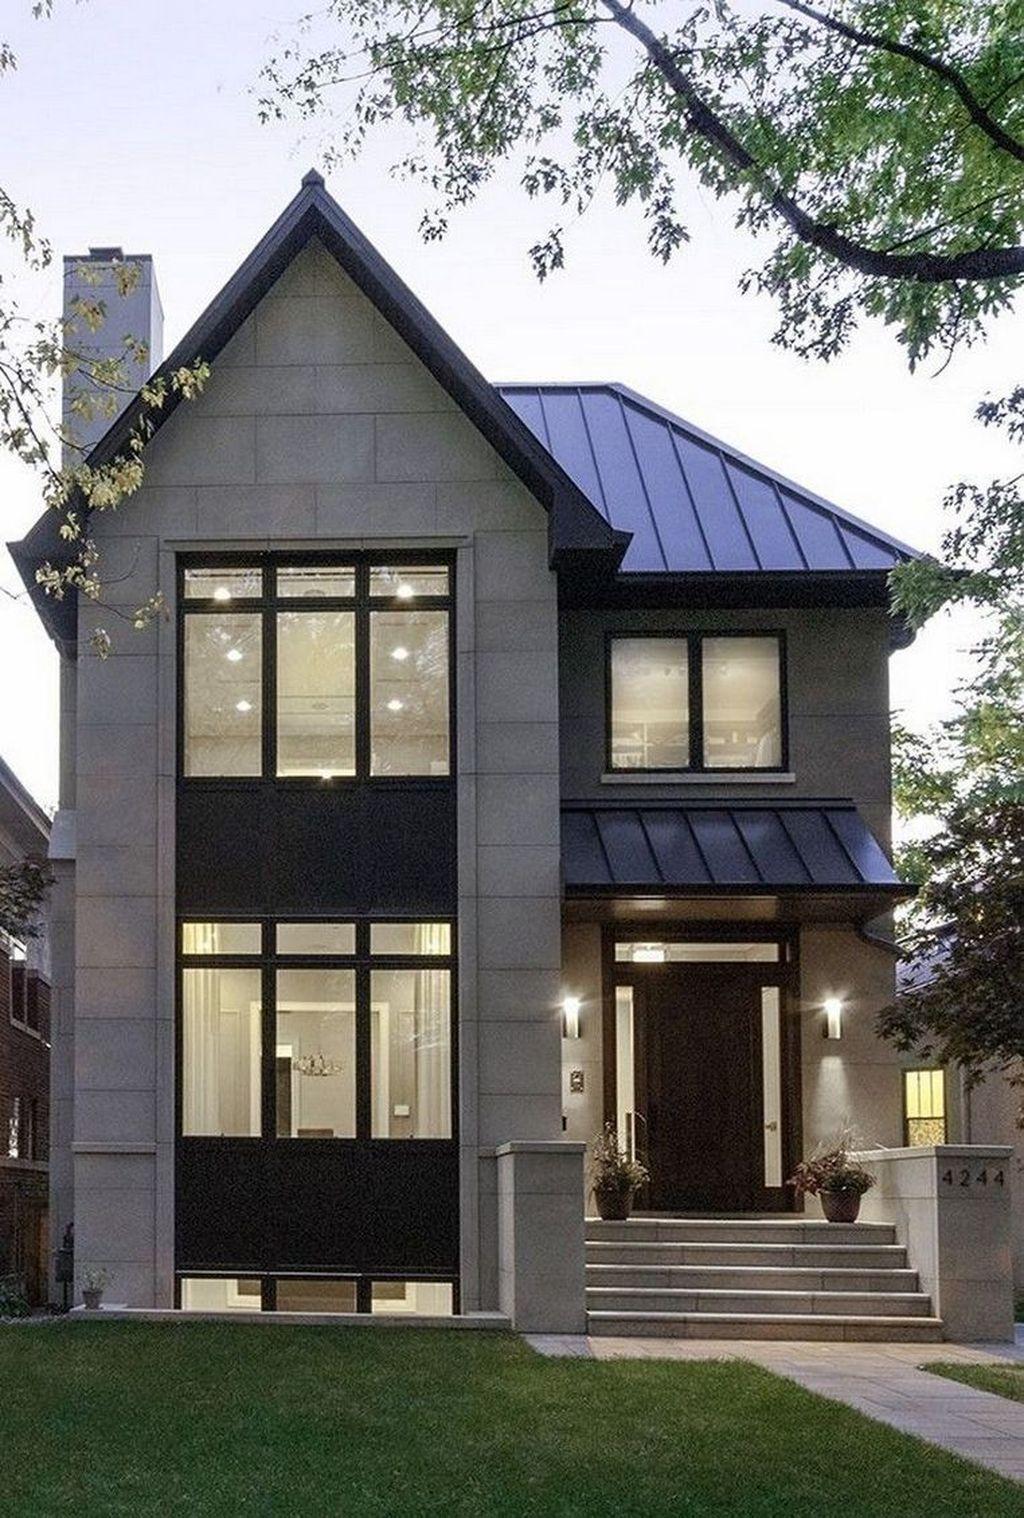 37 Stunning Contemporary House Exterior Design Ideas You Should Copy In 2020 Contemporary House Exterior House Exterior House Architecture Design